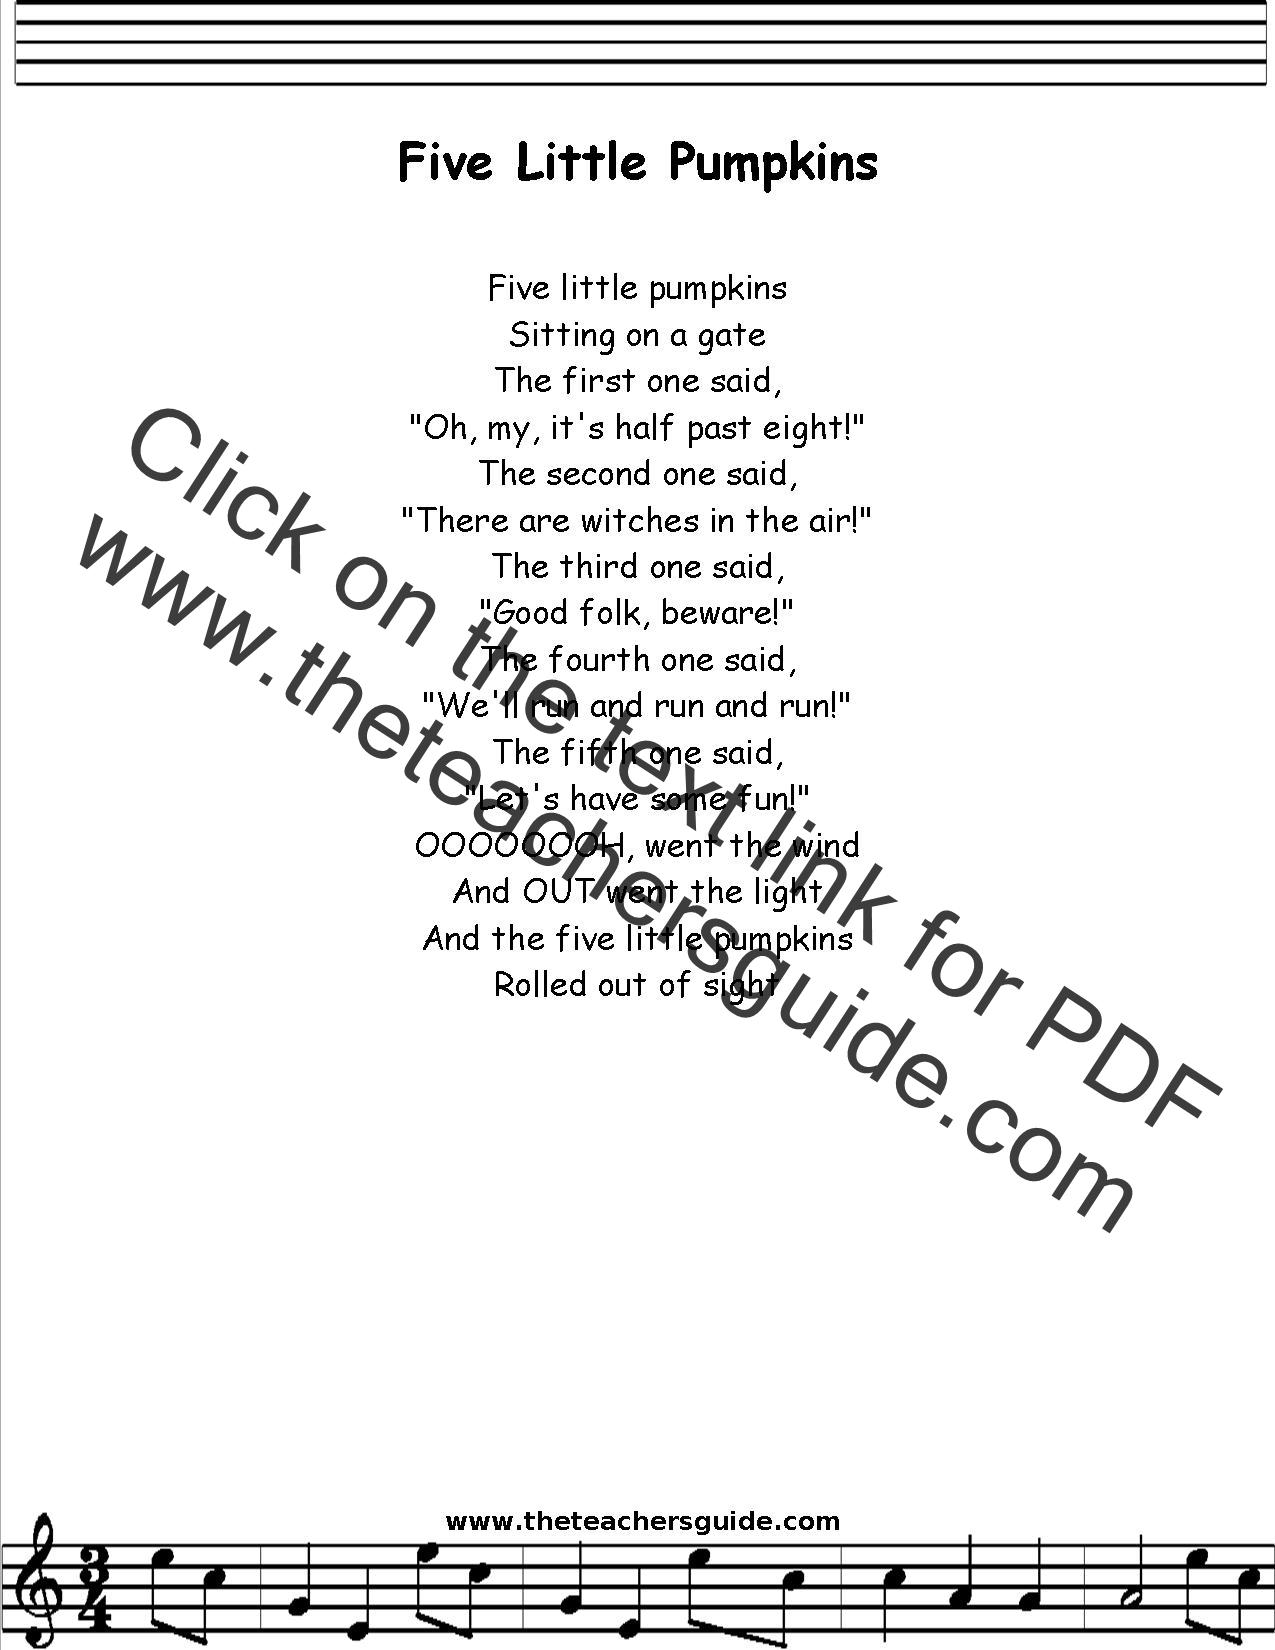 27 Images of Five Little Pumpkins Template | eucotech.com